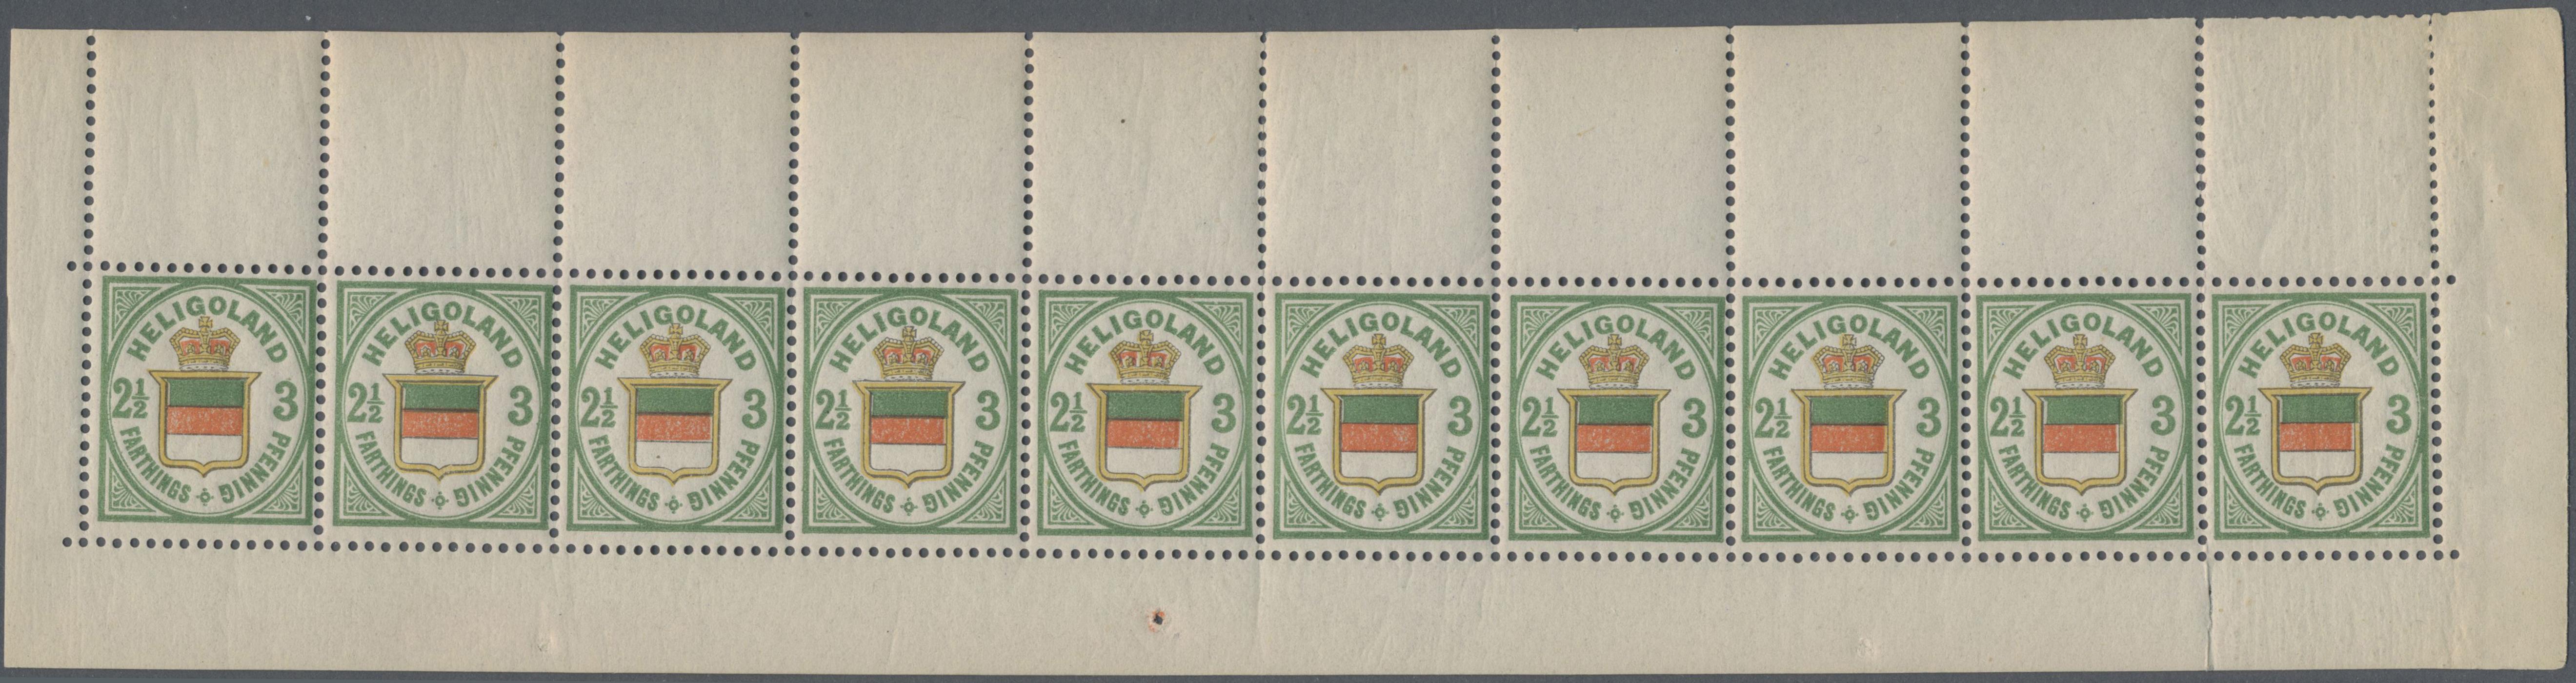 Lot 36257 - Helgoland - Marken und Briefe  -  Auktionshaus Christoph Gärtner GmbH & Co. KG Sale #44 Collections Germany